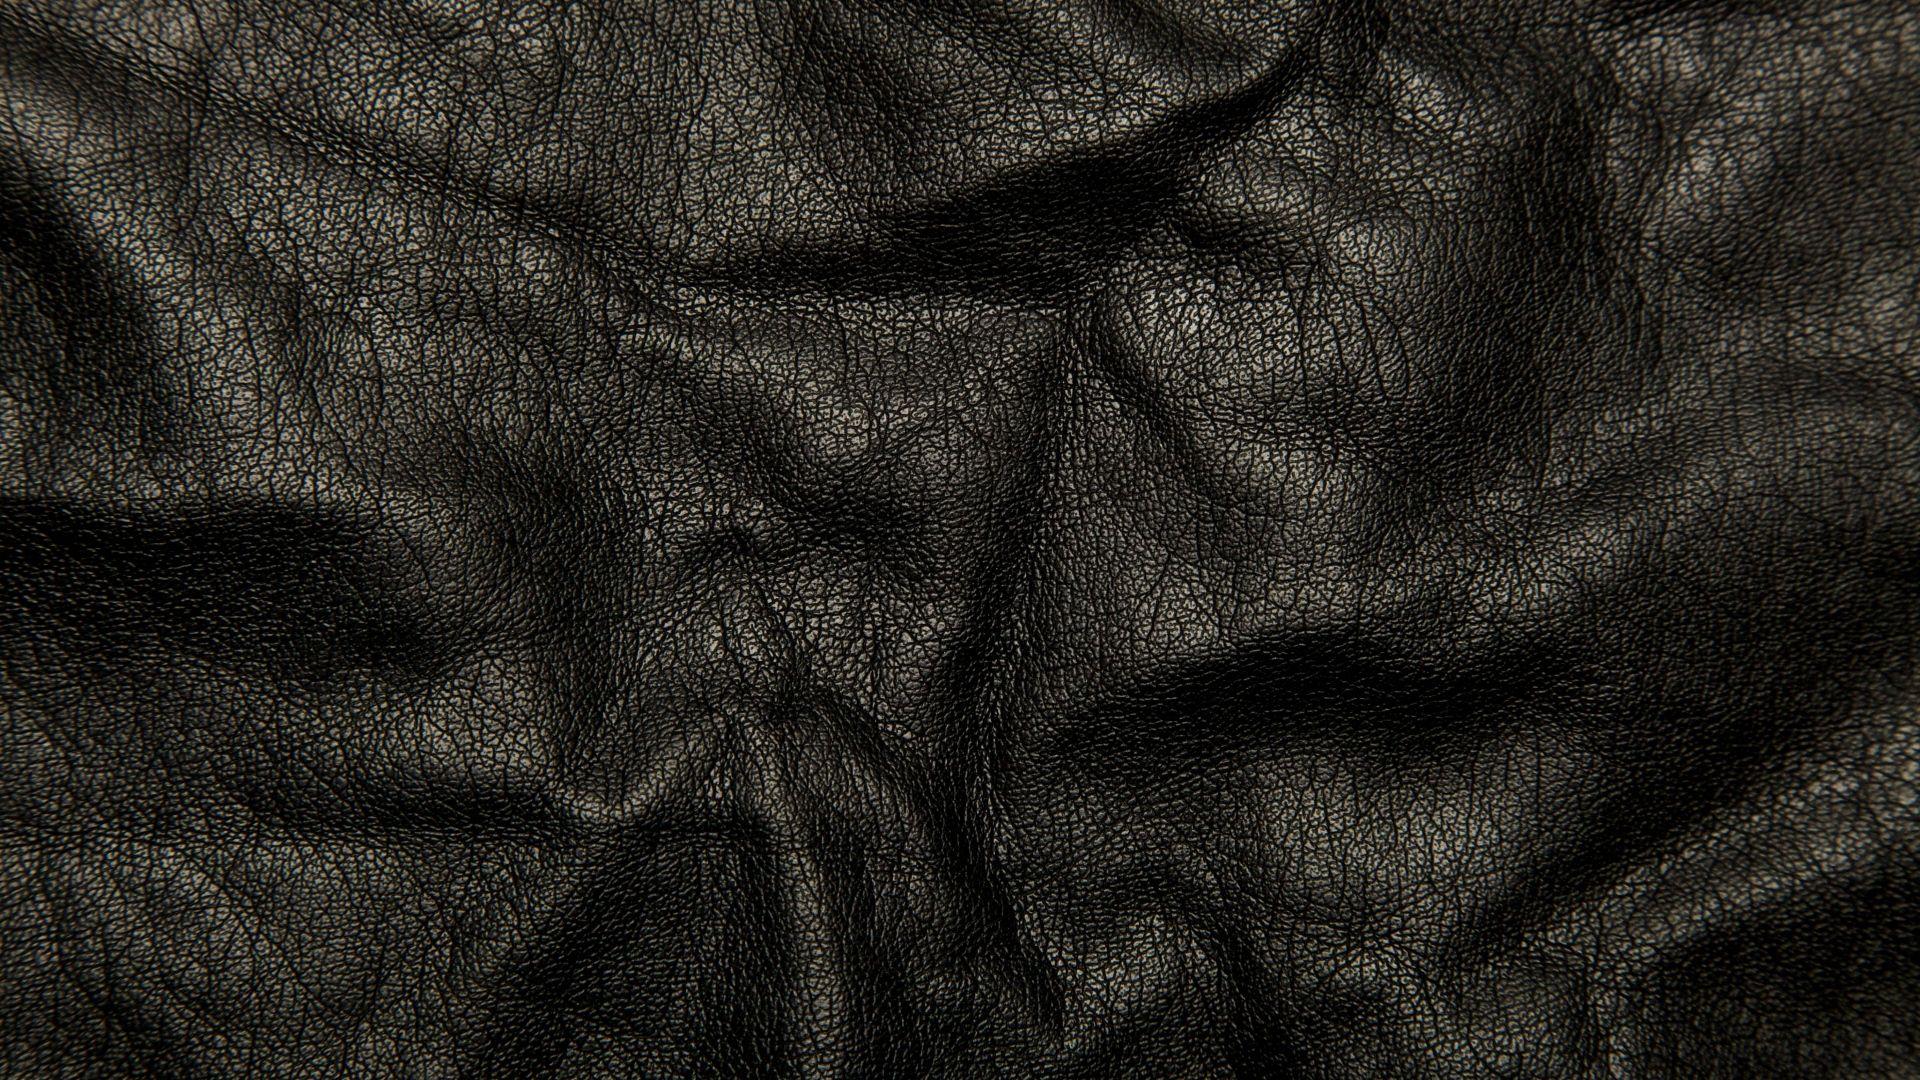 Leather Black Background Texture Wrinkles Cracks 75771 1920x1080